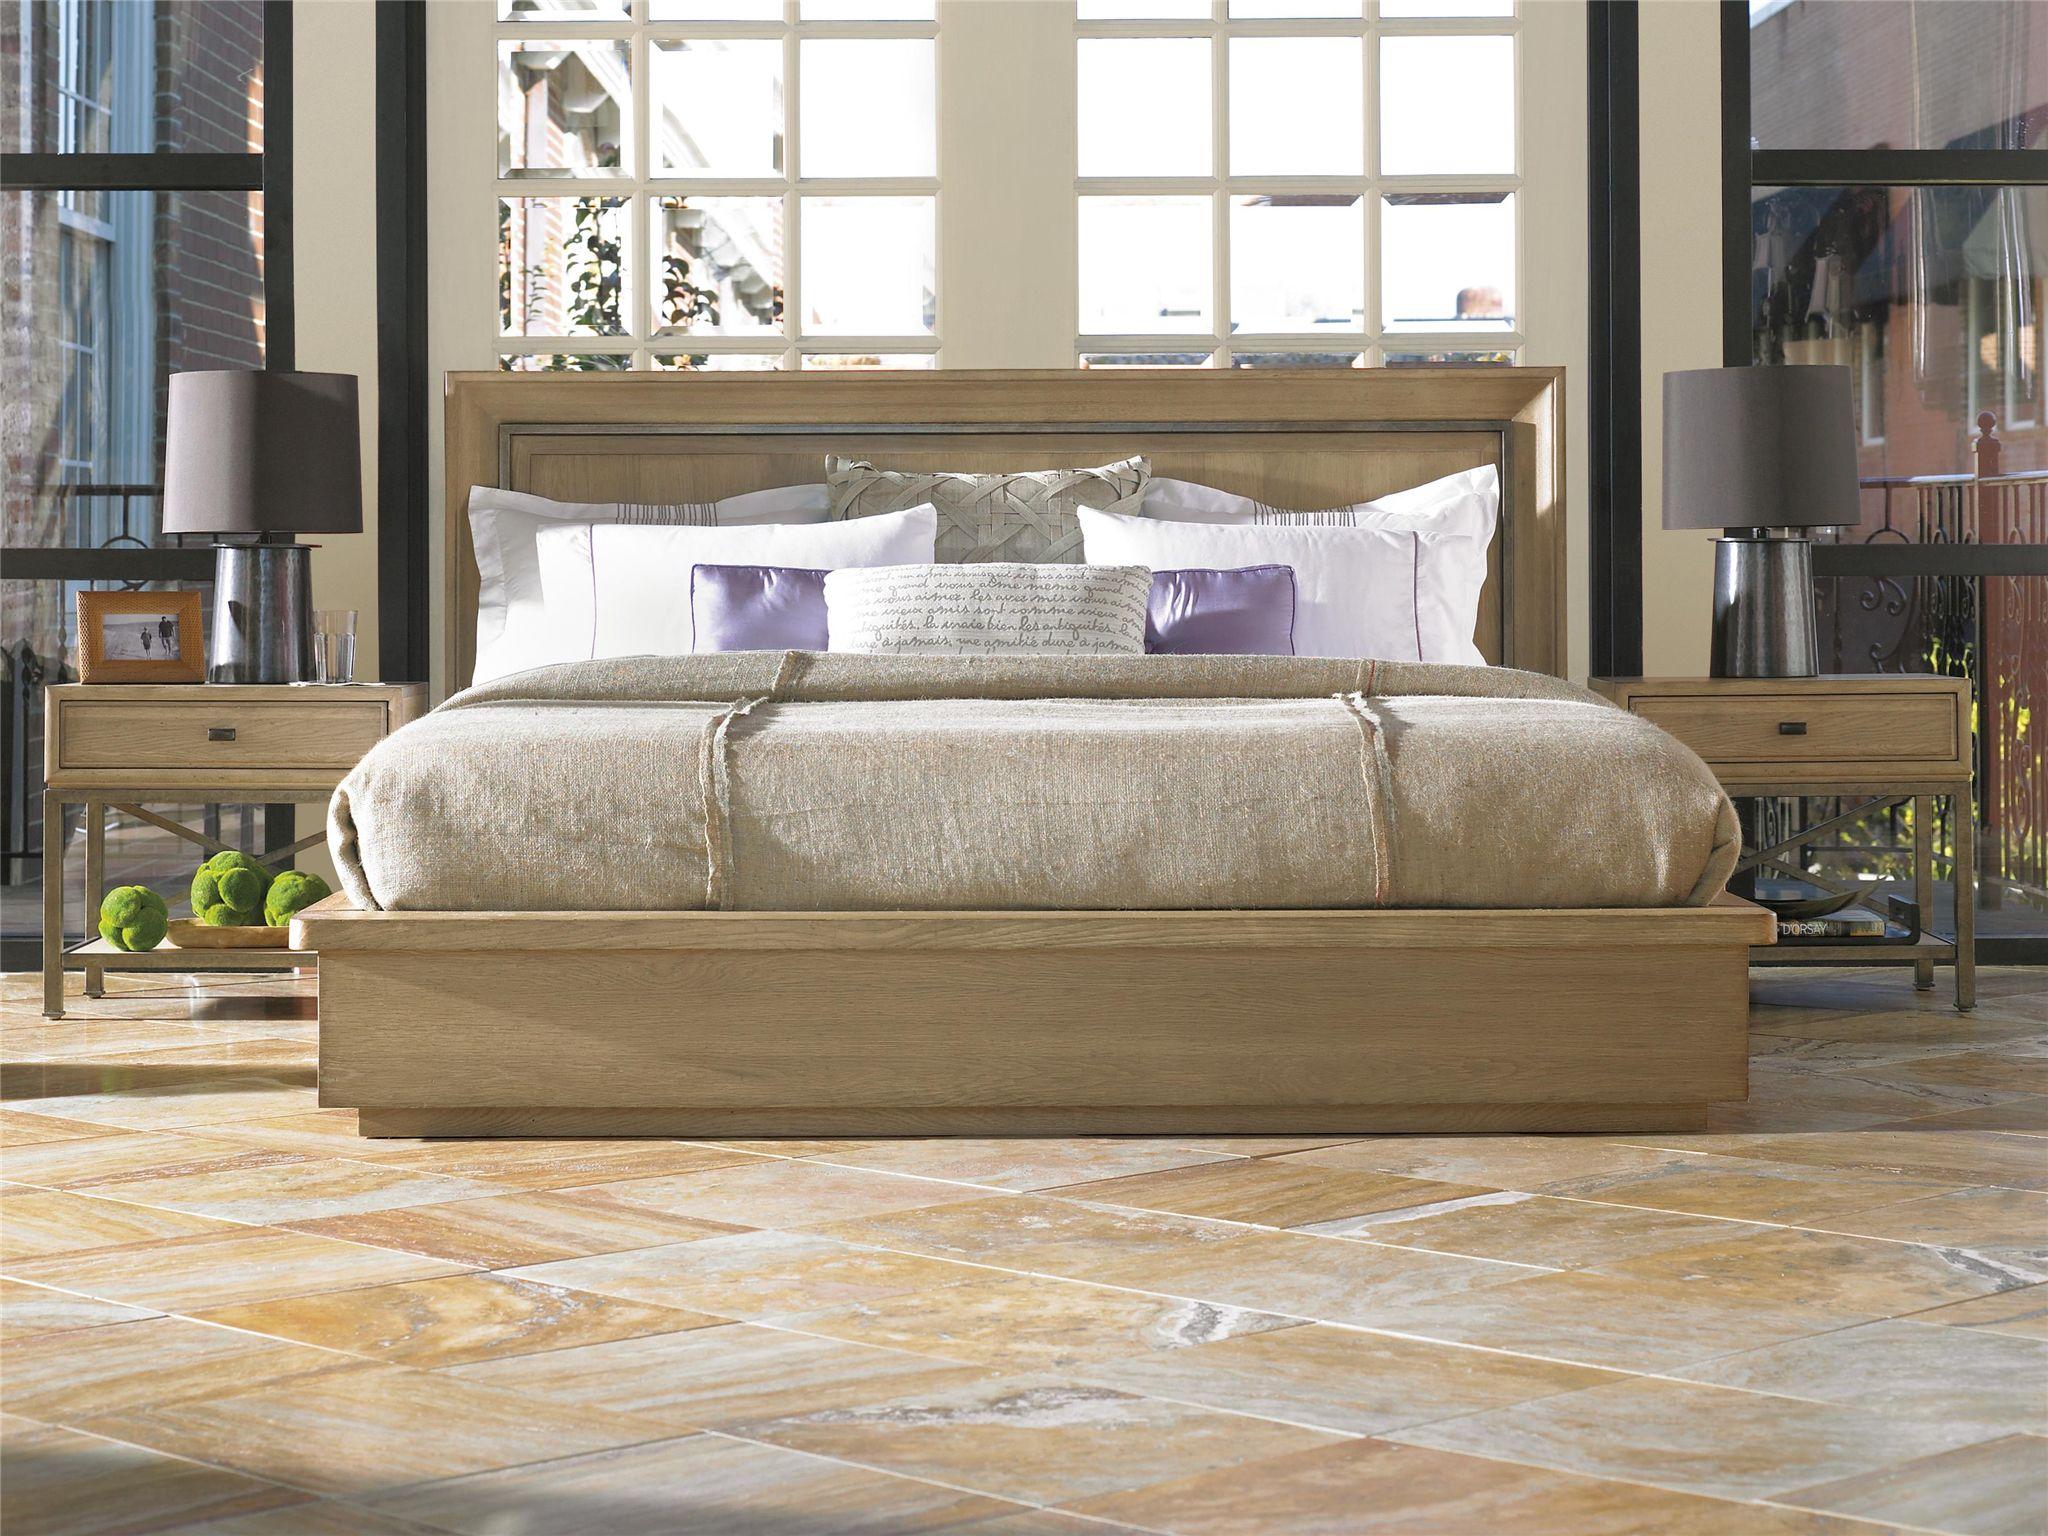 universal furniture forecast loft bed king forecast